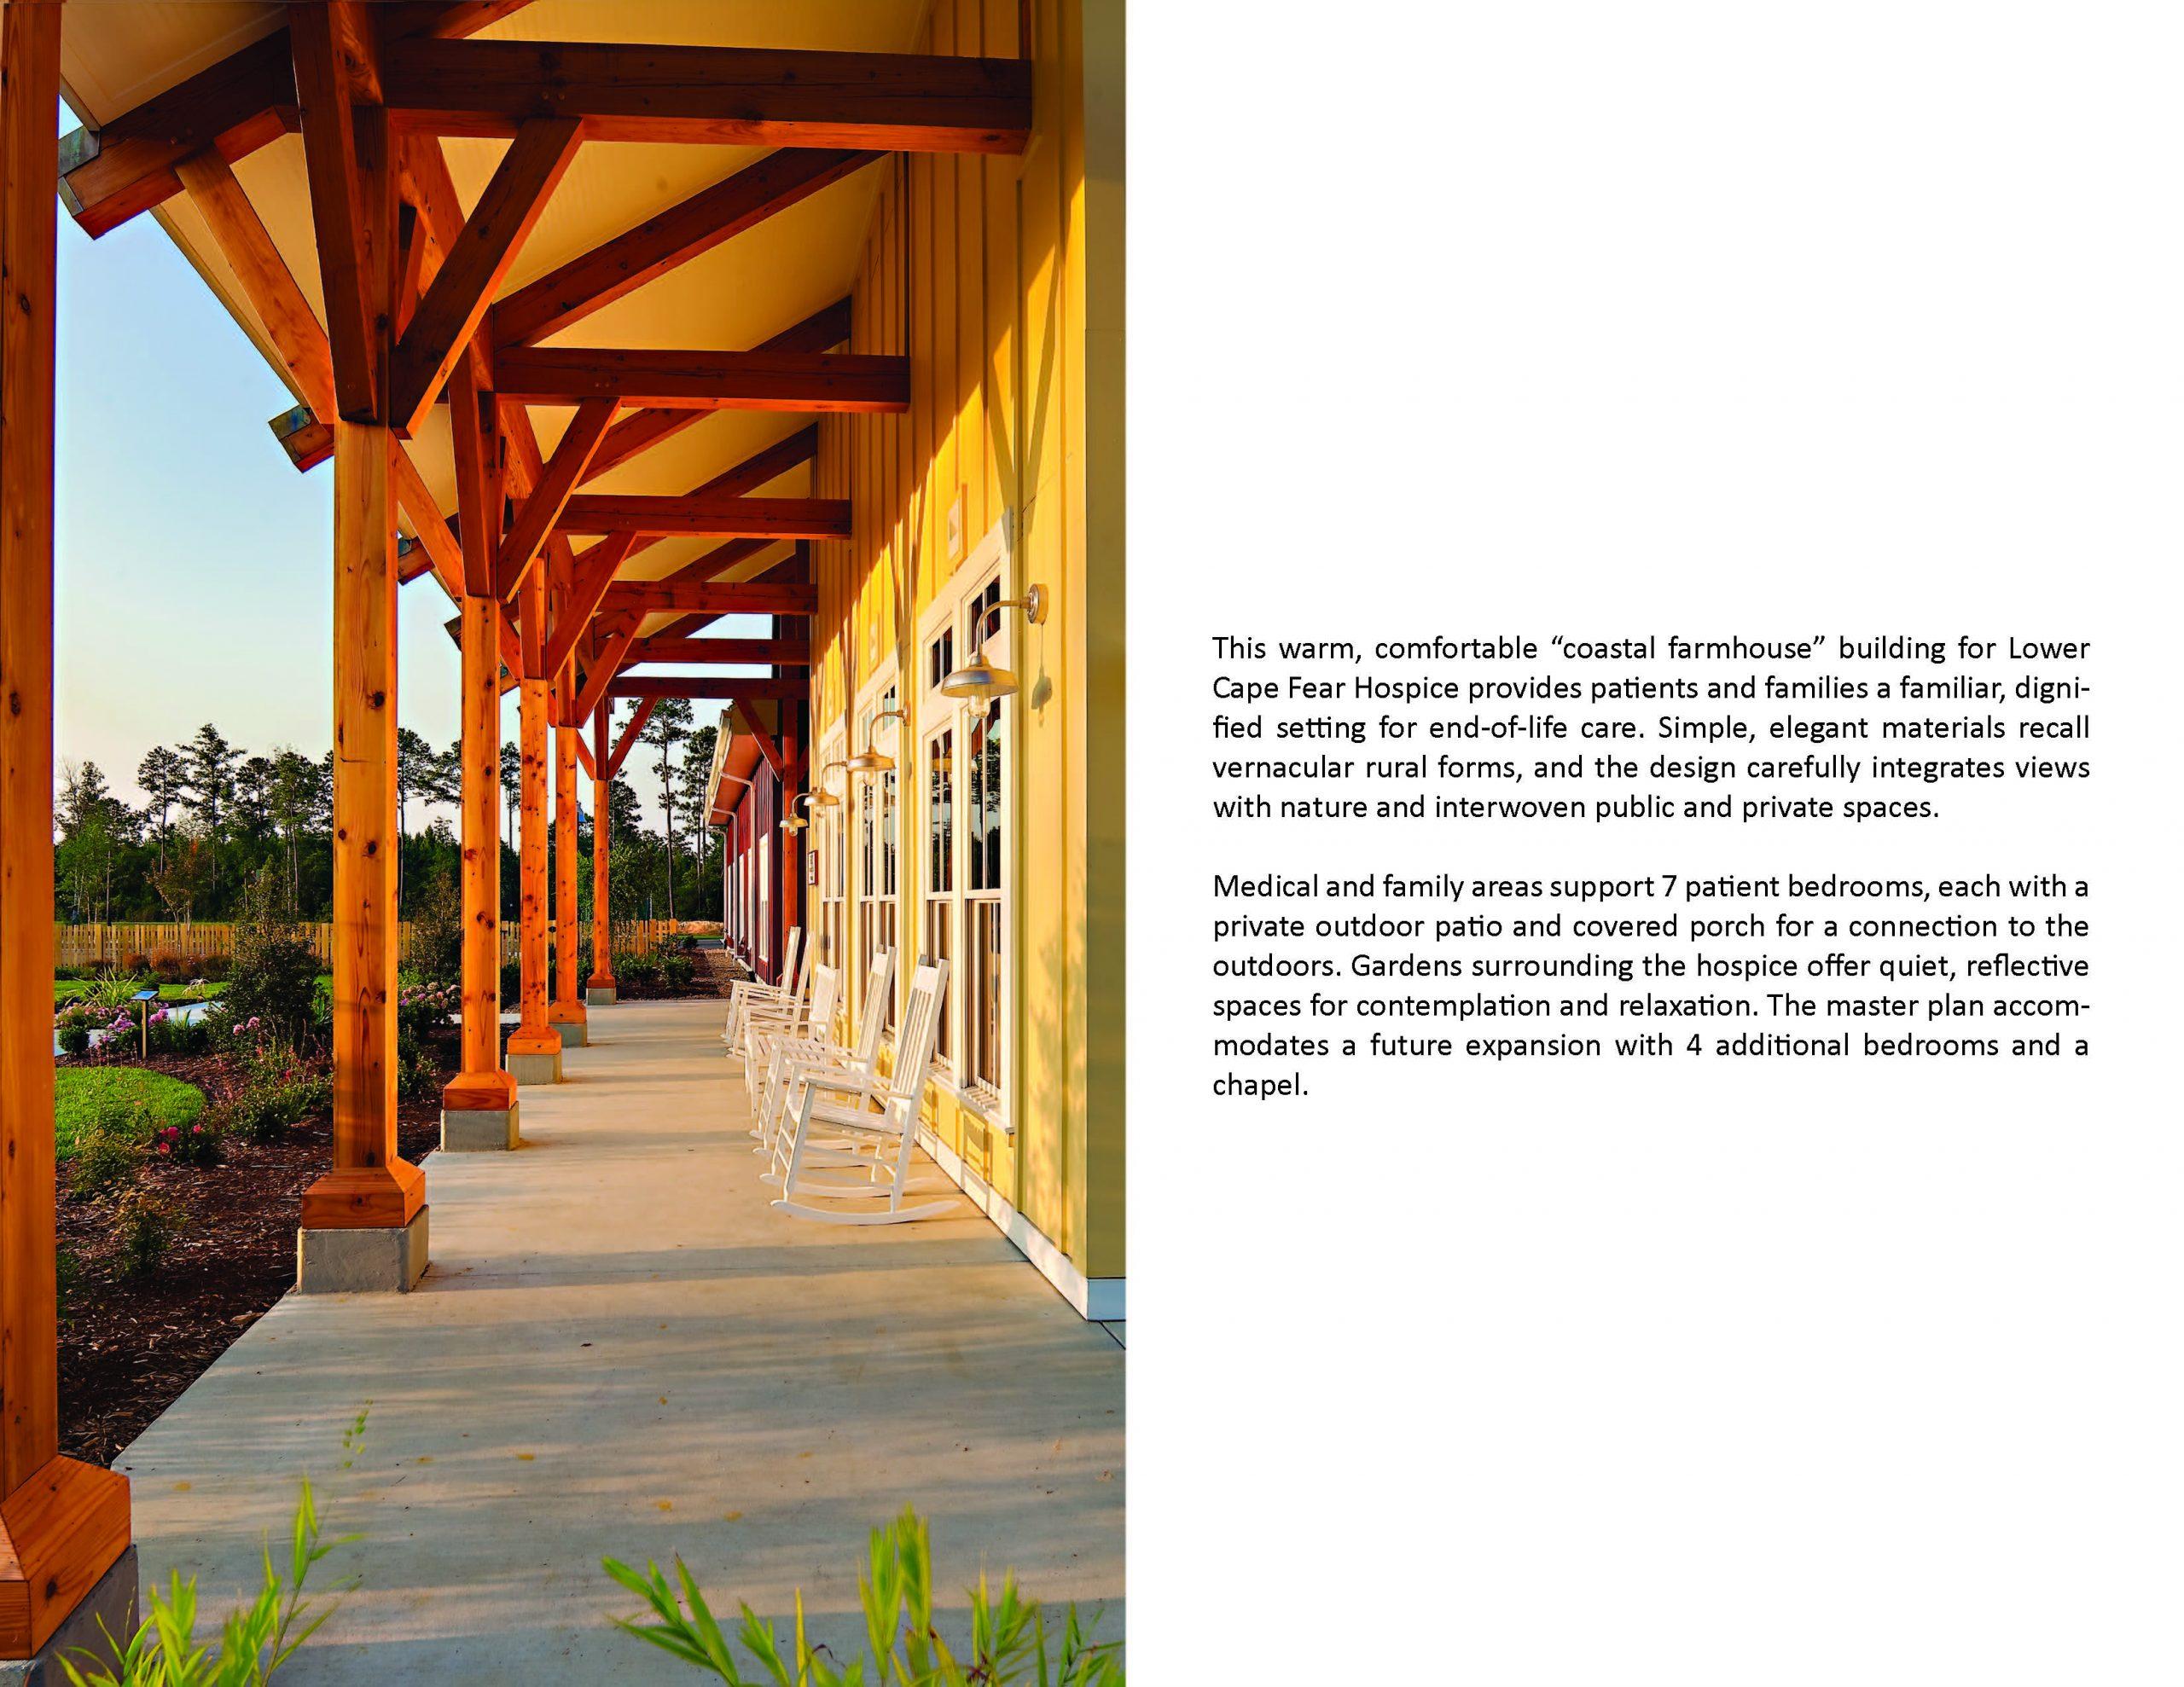 Lower Cape Fear Hospice & LifeCare Center